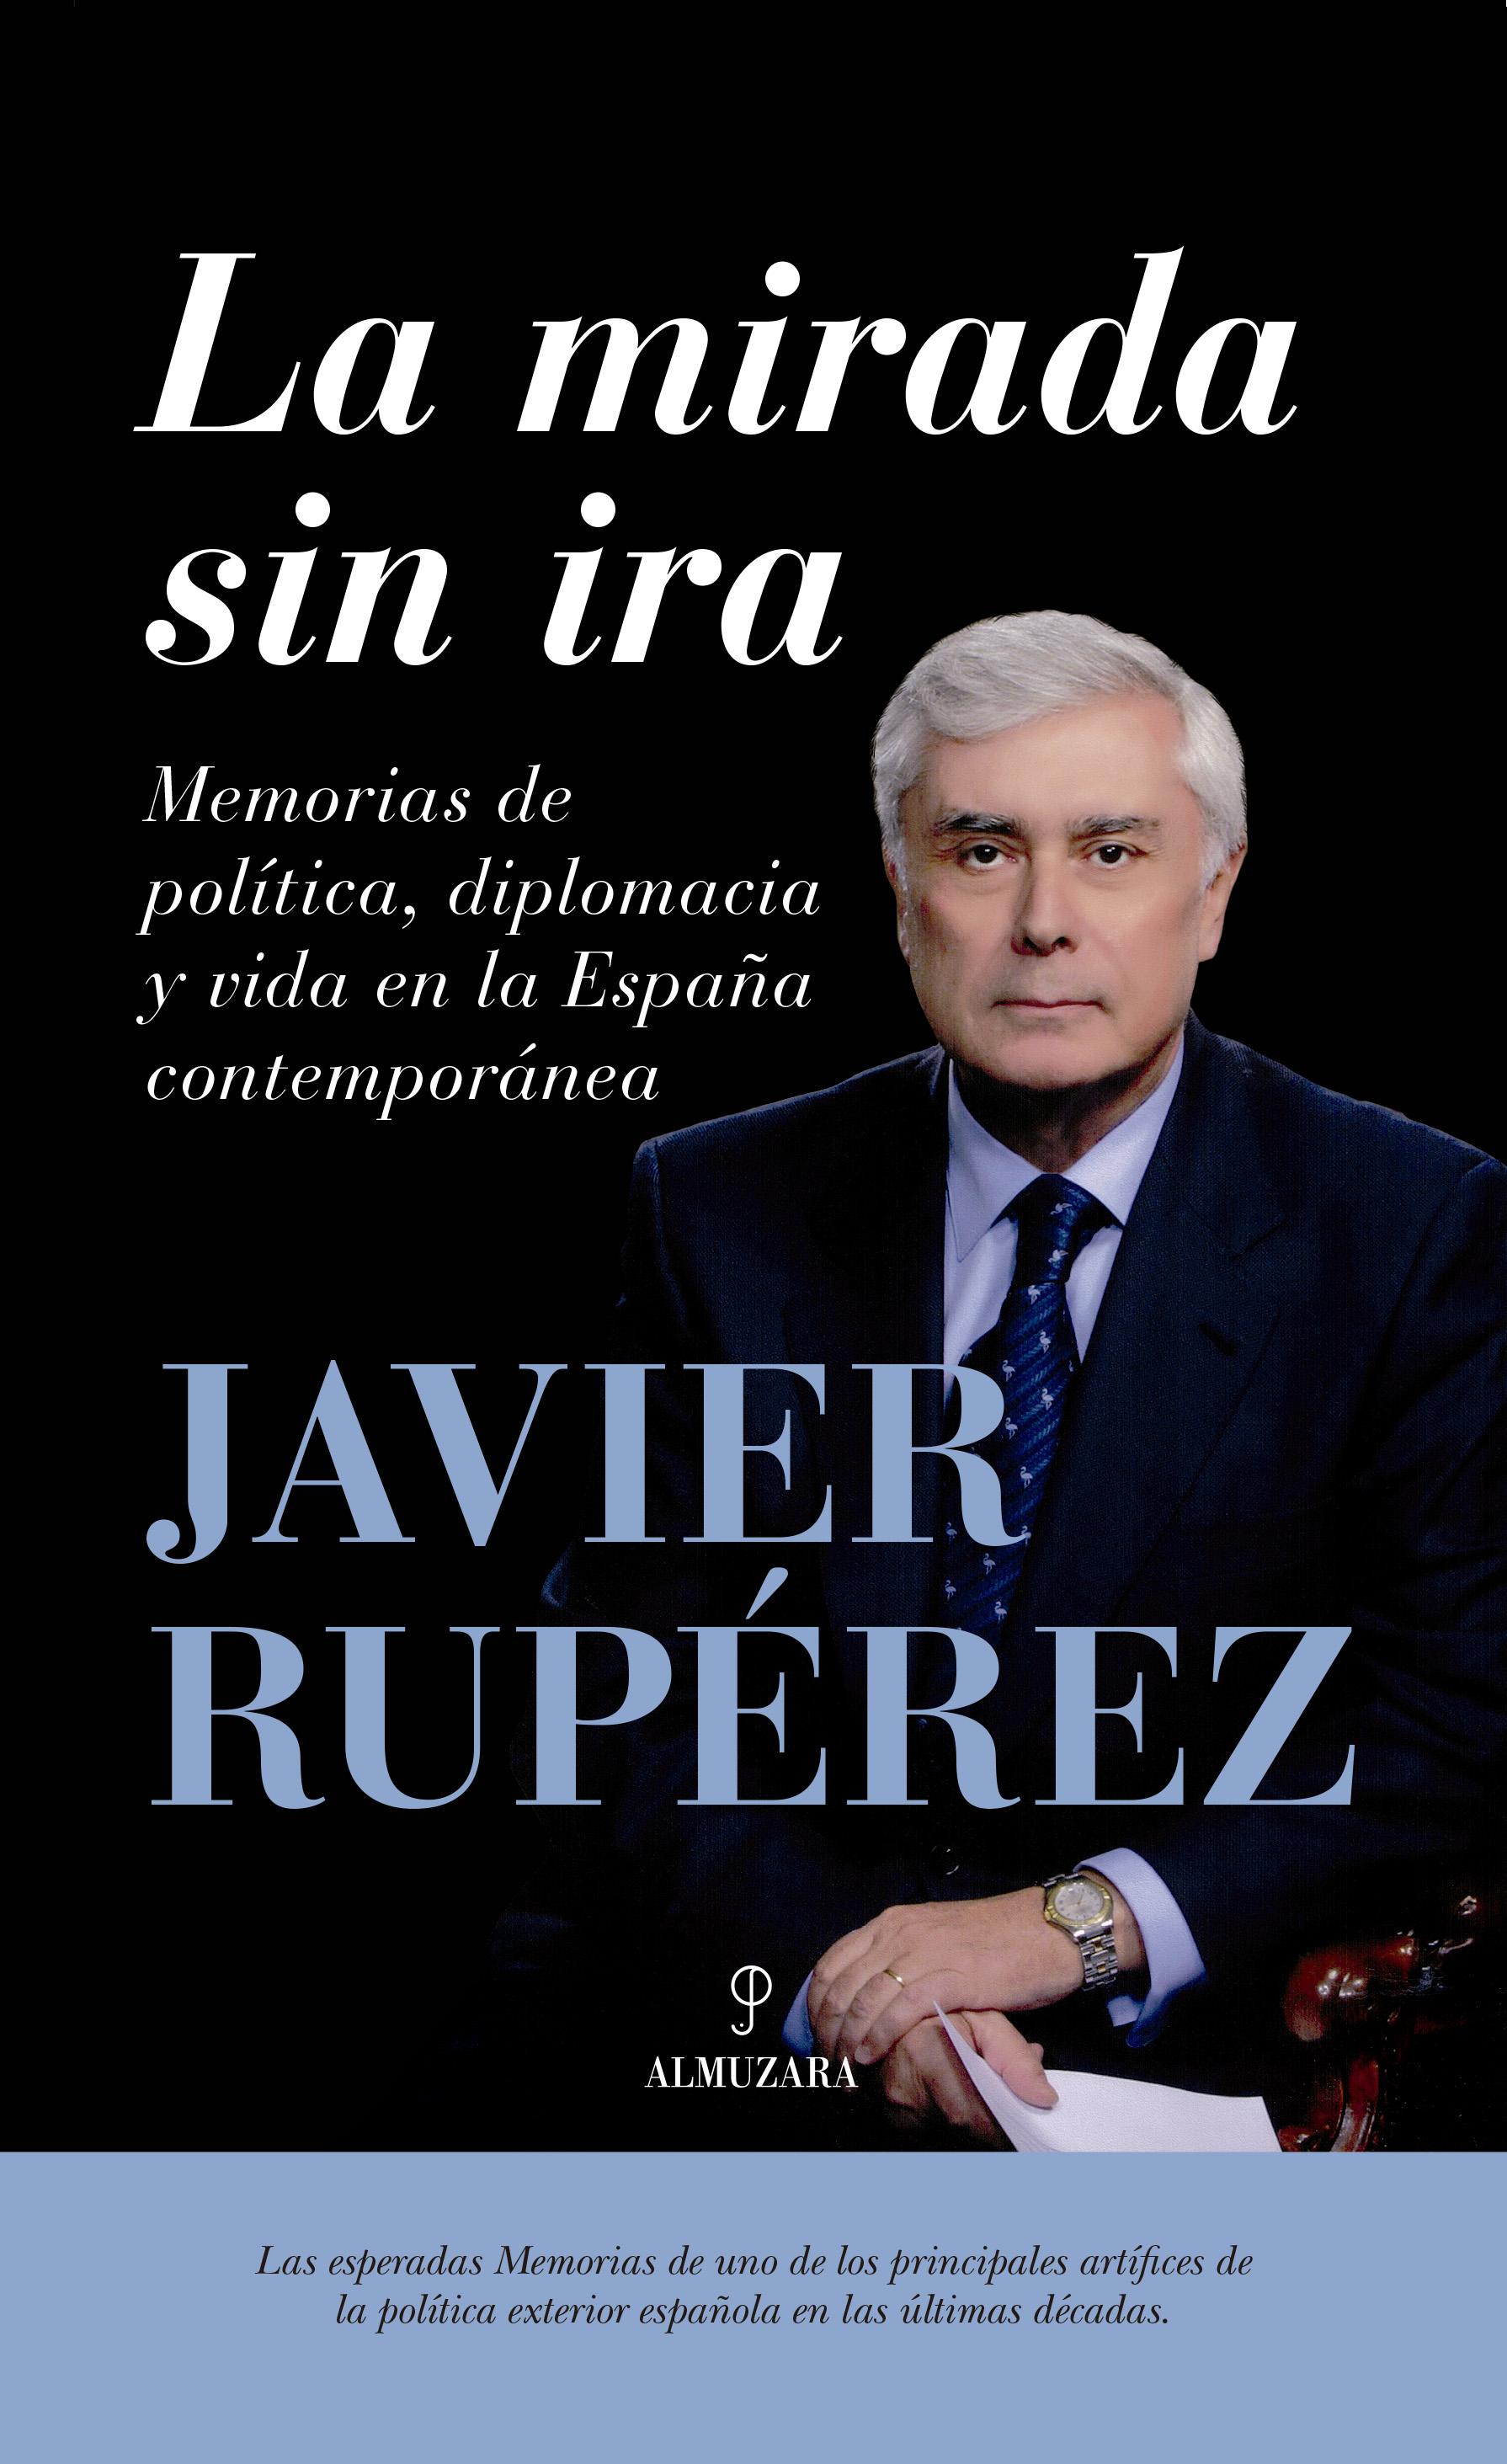 Javier Rupérez